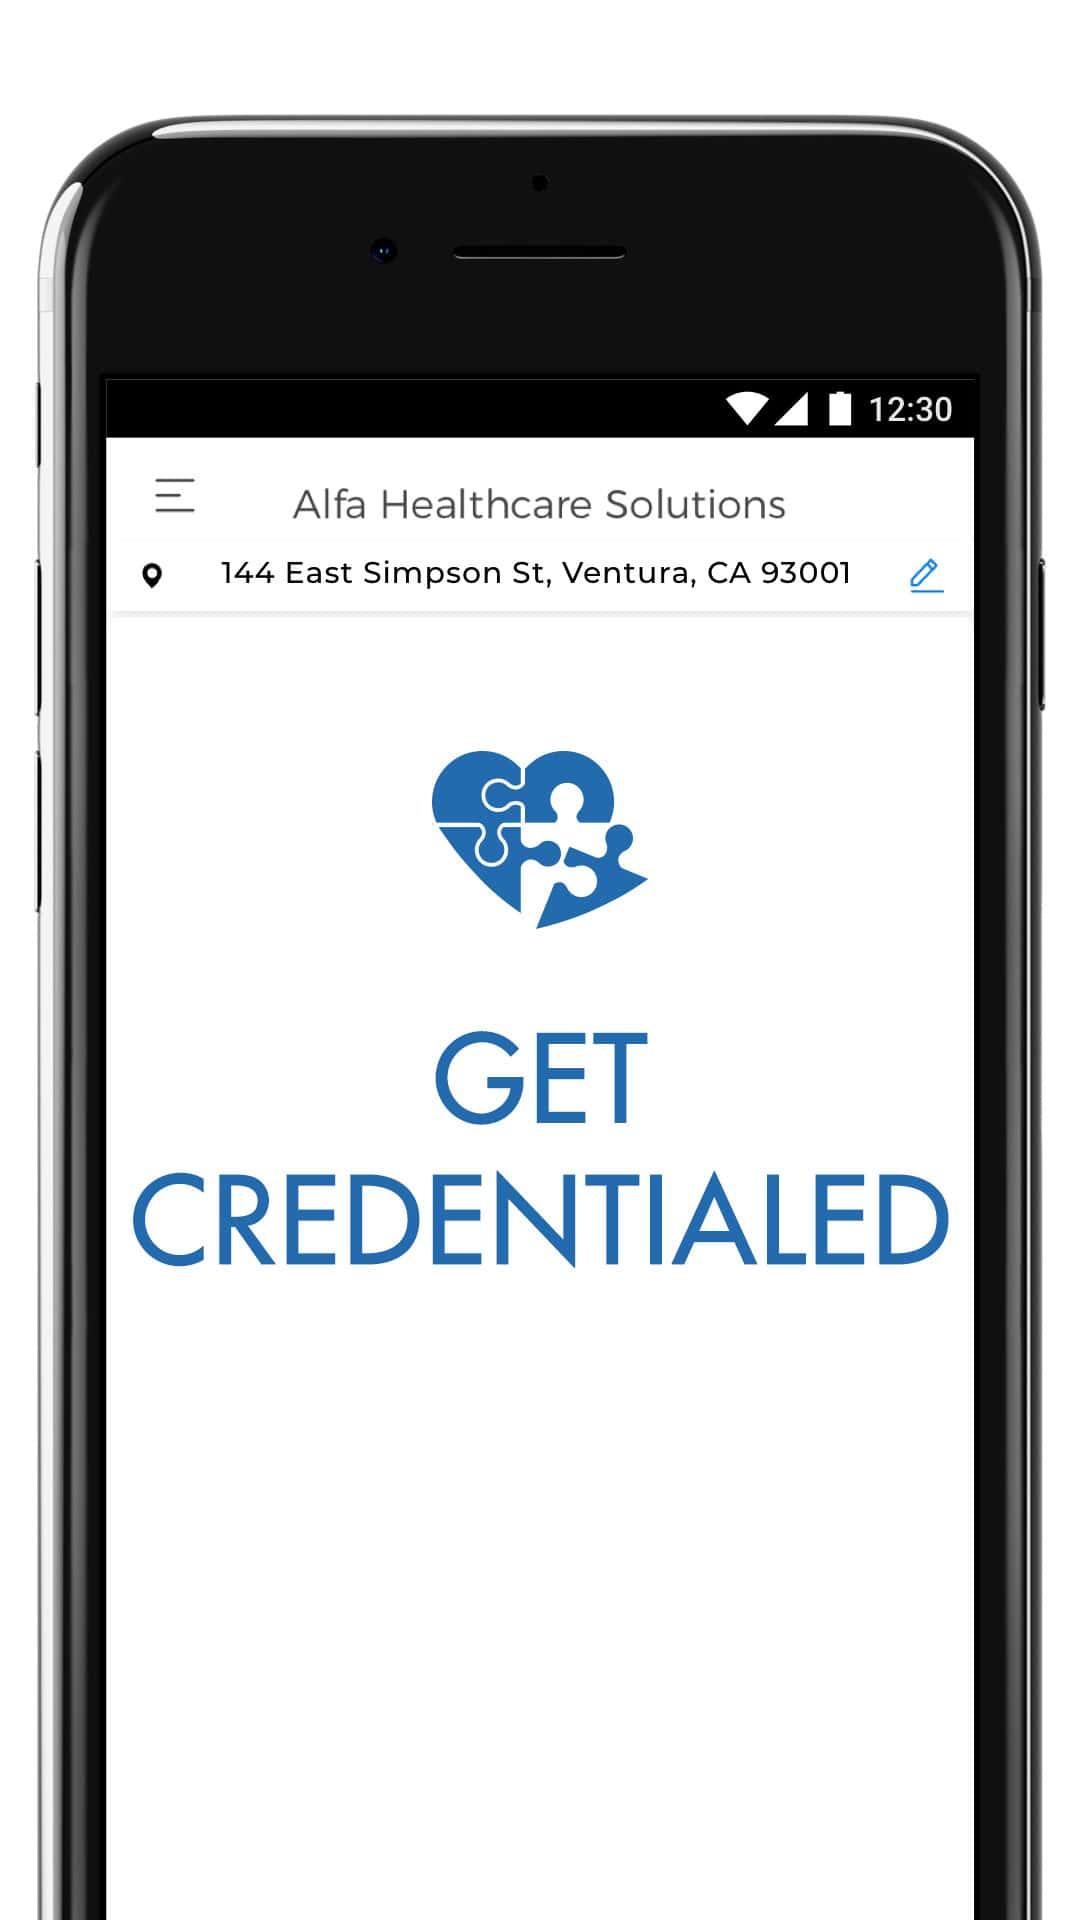 Get Credentialed